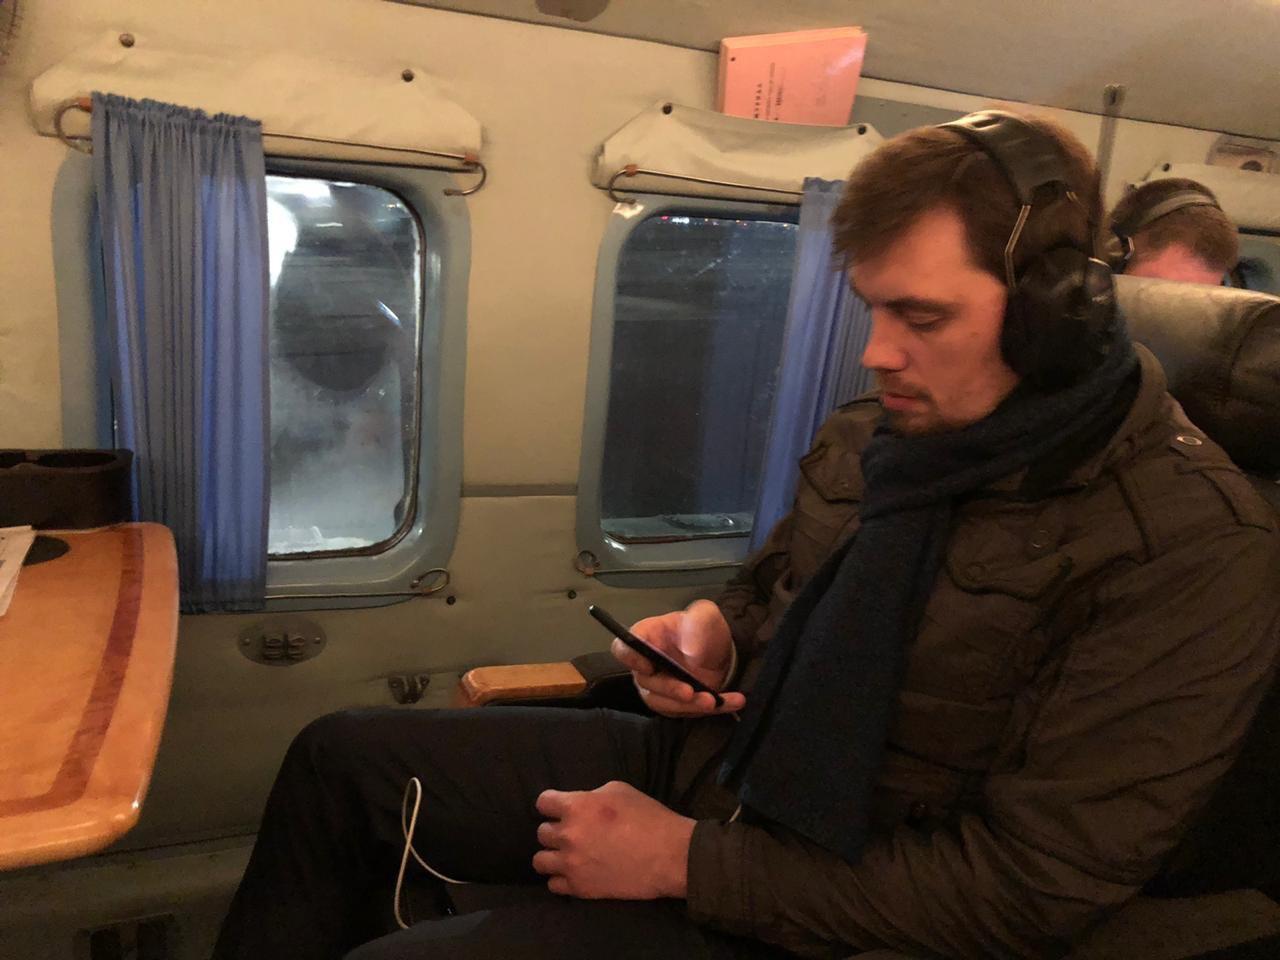 Эвакуация из Уханя: Гончарук поблагодарил экипаж самолета